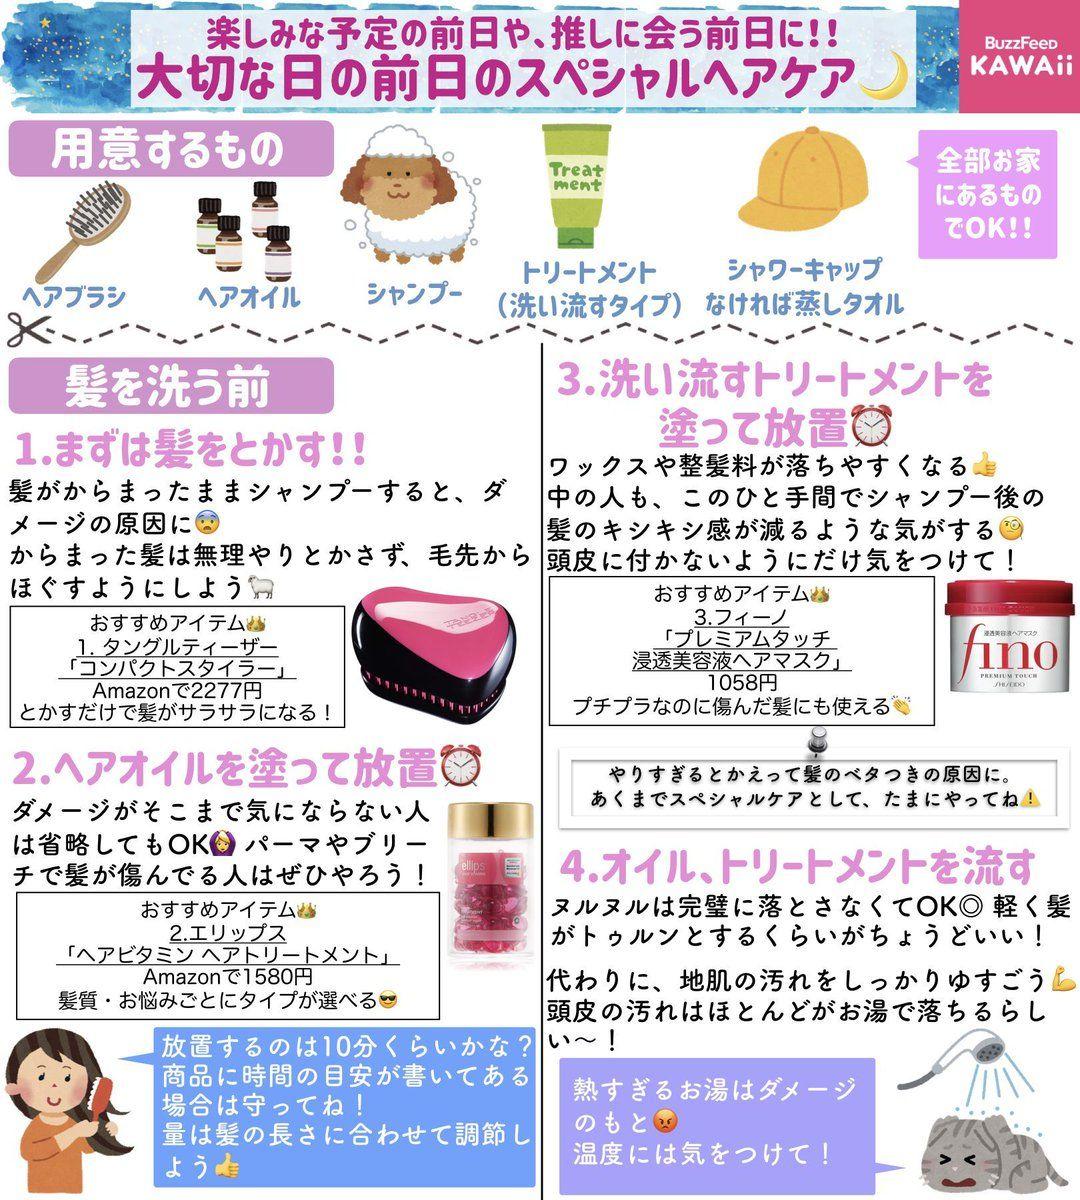 Buzzfeed Kawaii On ヘアケア スキンケア用品 美容の裏技